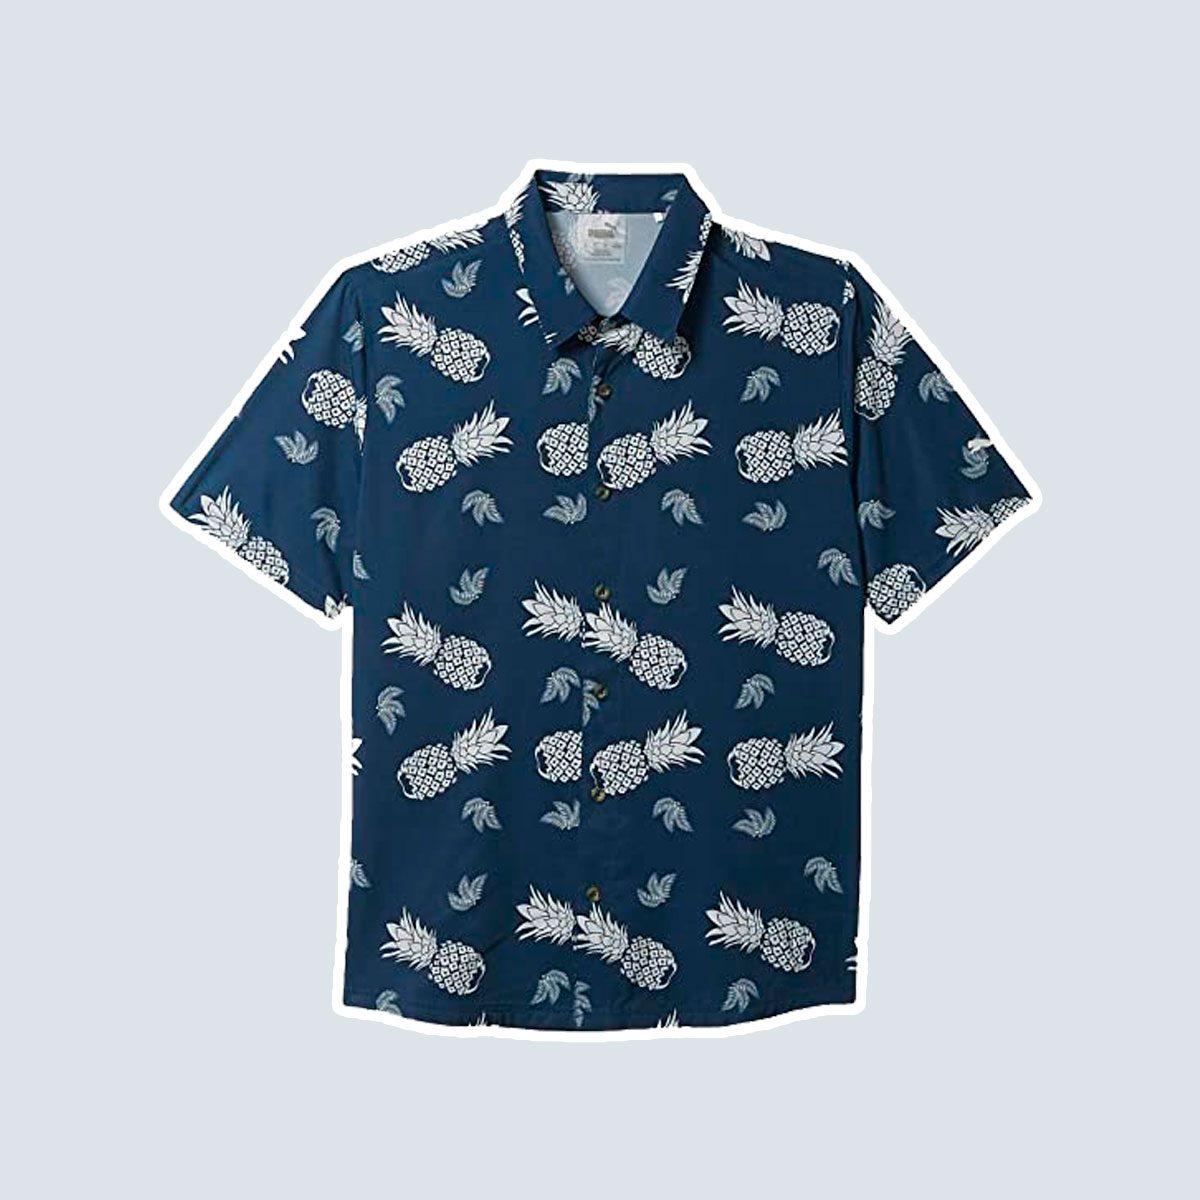 Pineapple button down shirt